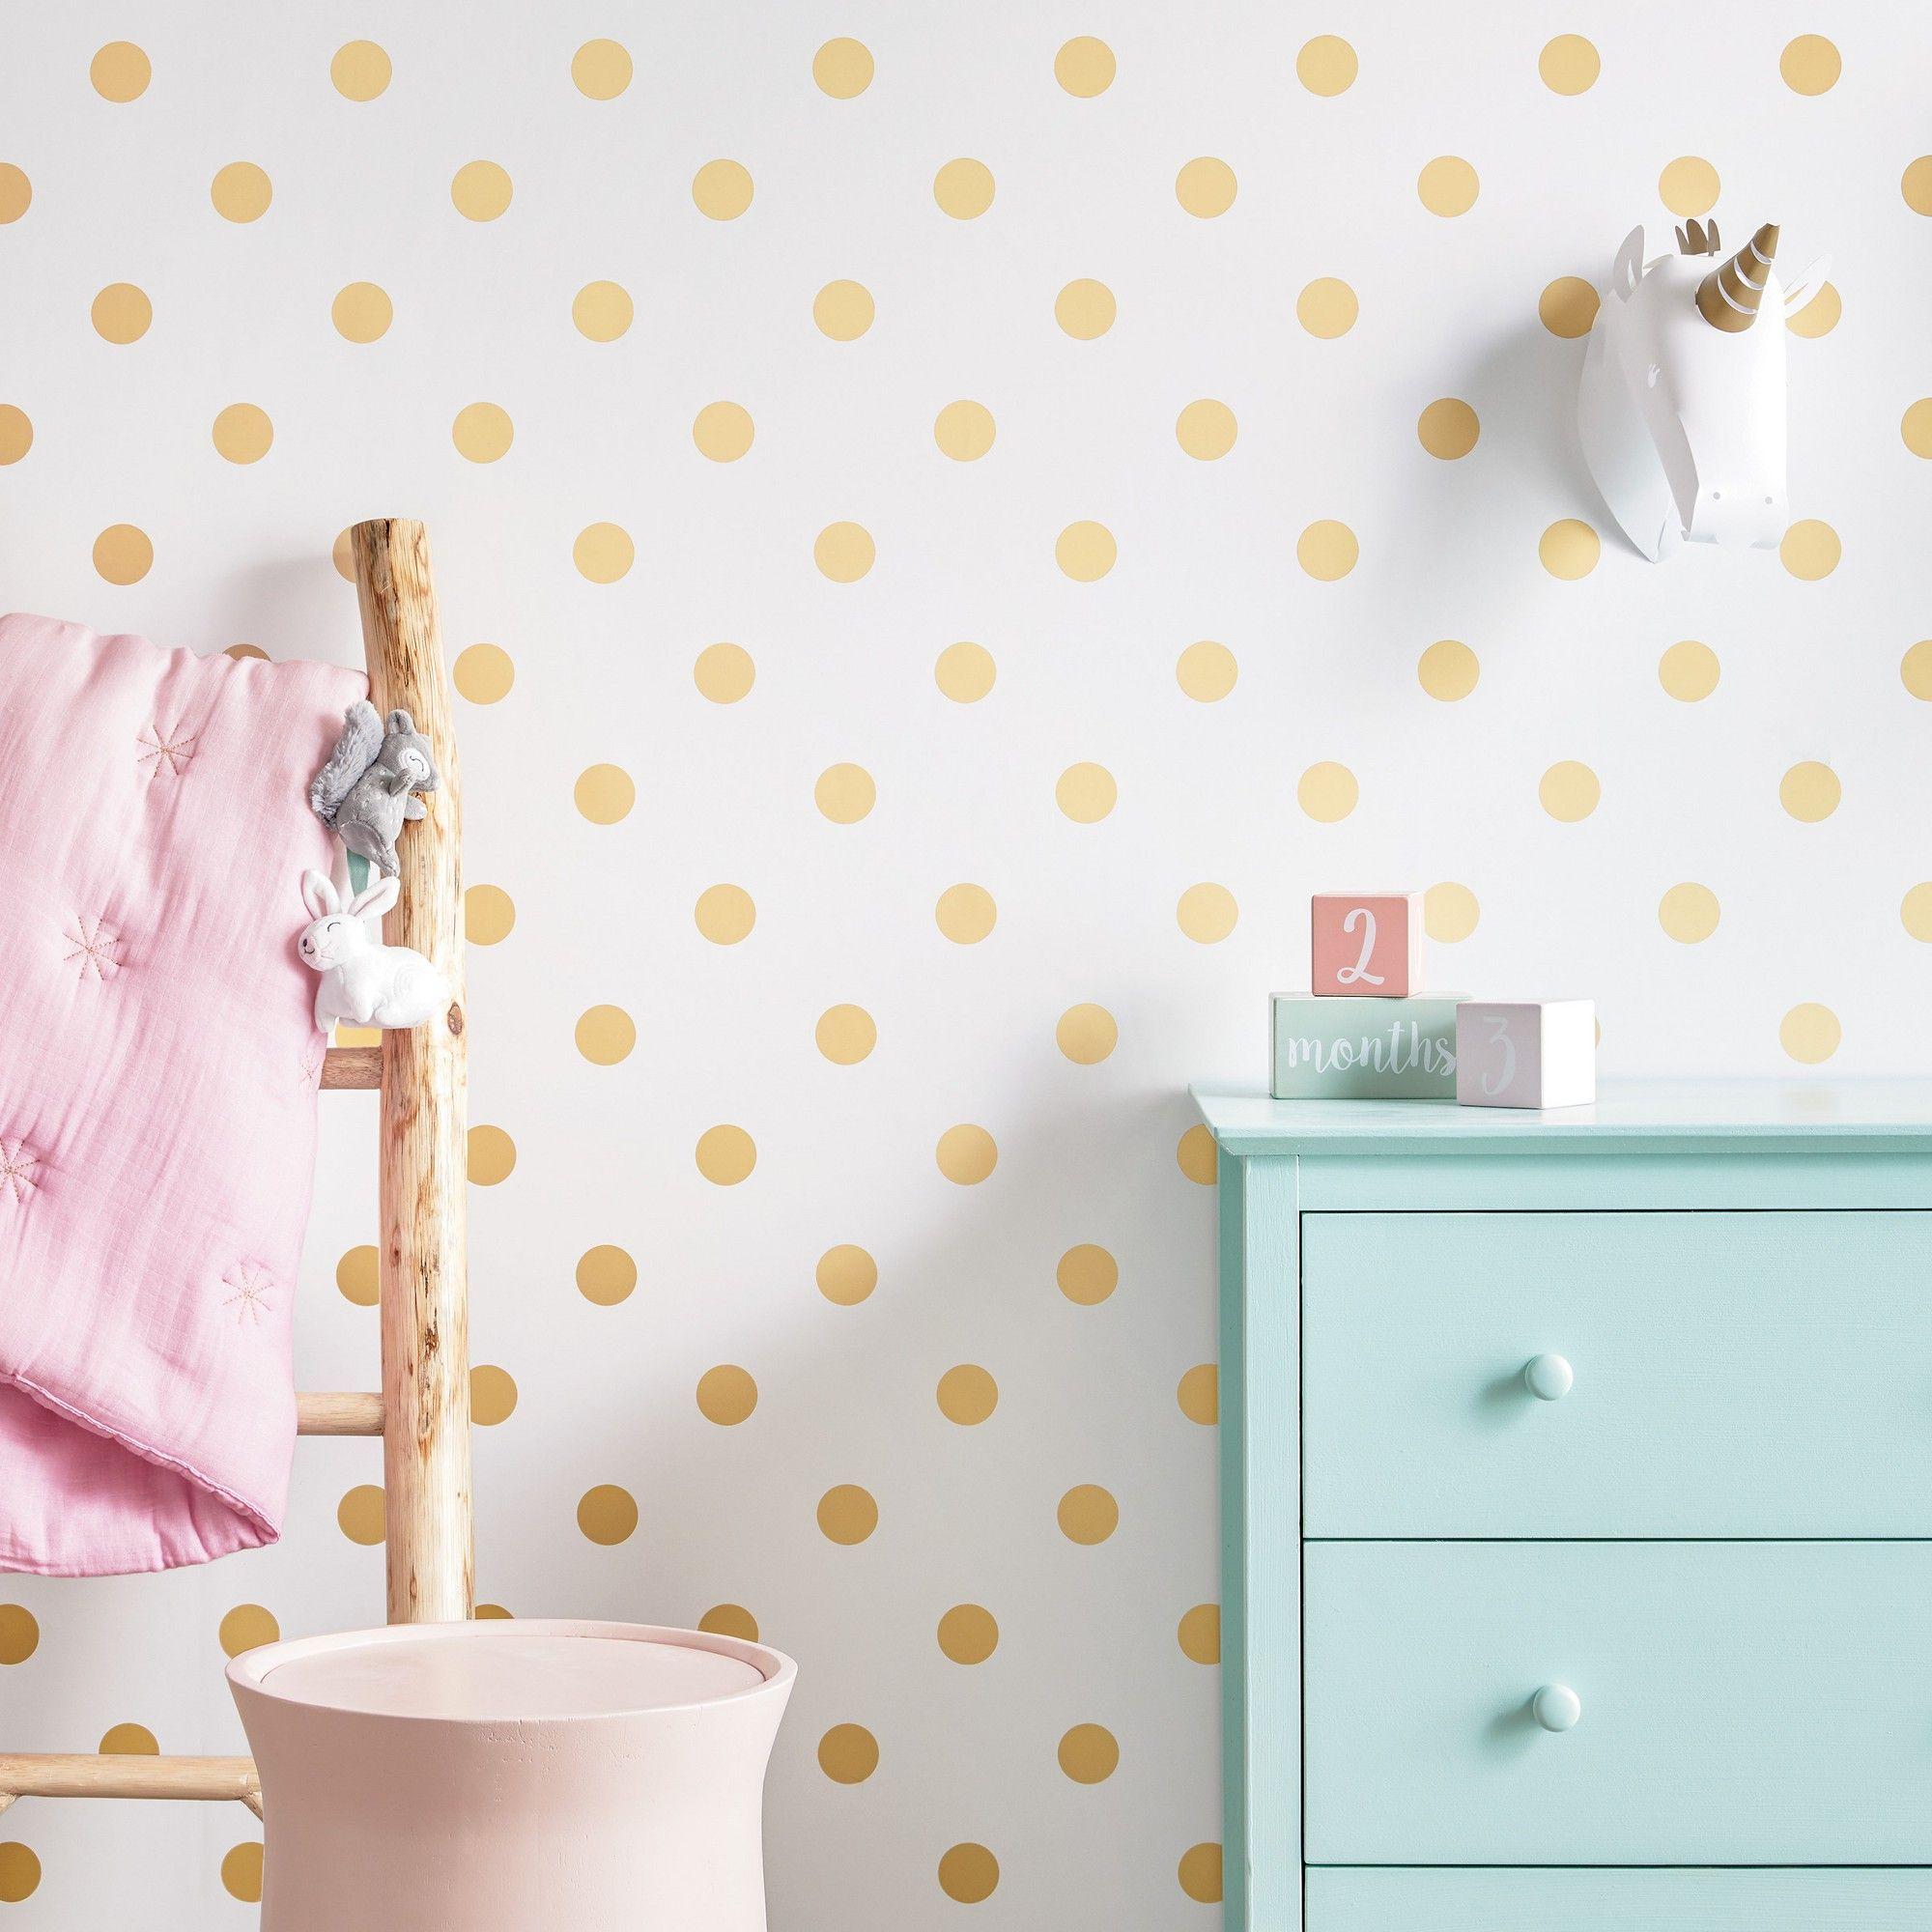 Speckled Dot Peel Stick Wallpaper Metallic Gold Opalhouse Living Room Upgrades Peel And Stick Wallpaper Dream Living Rooms